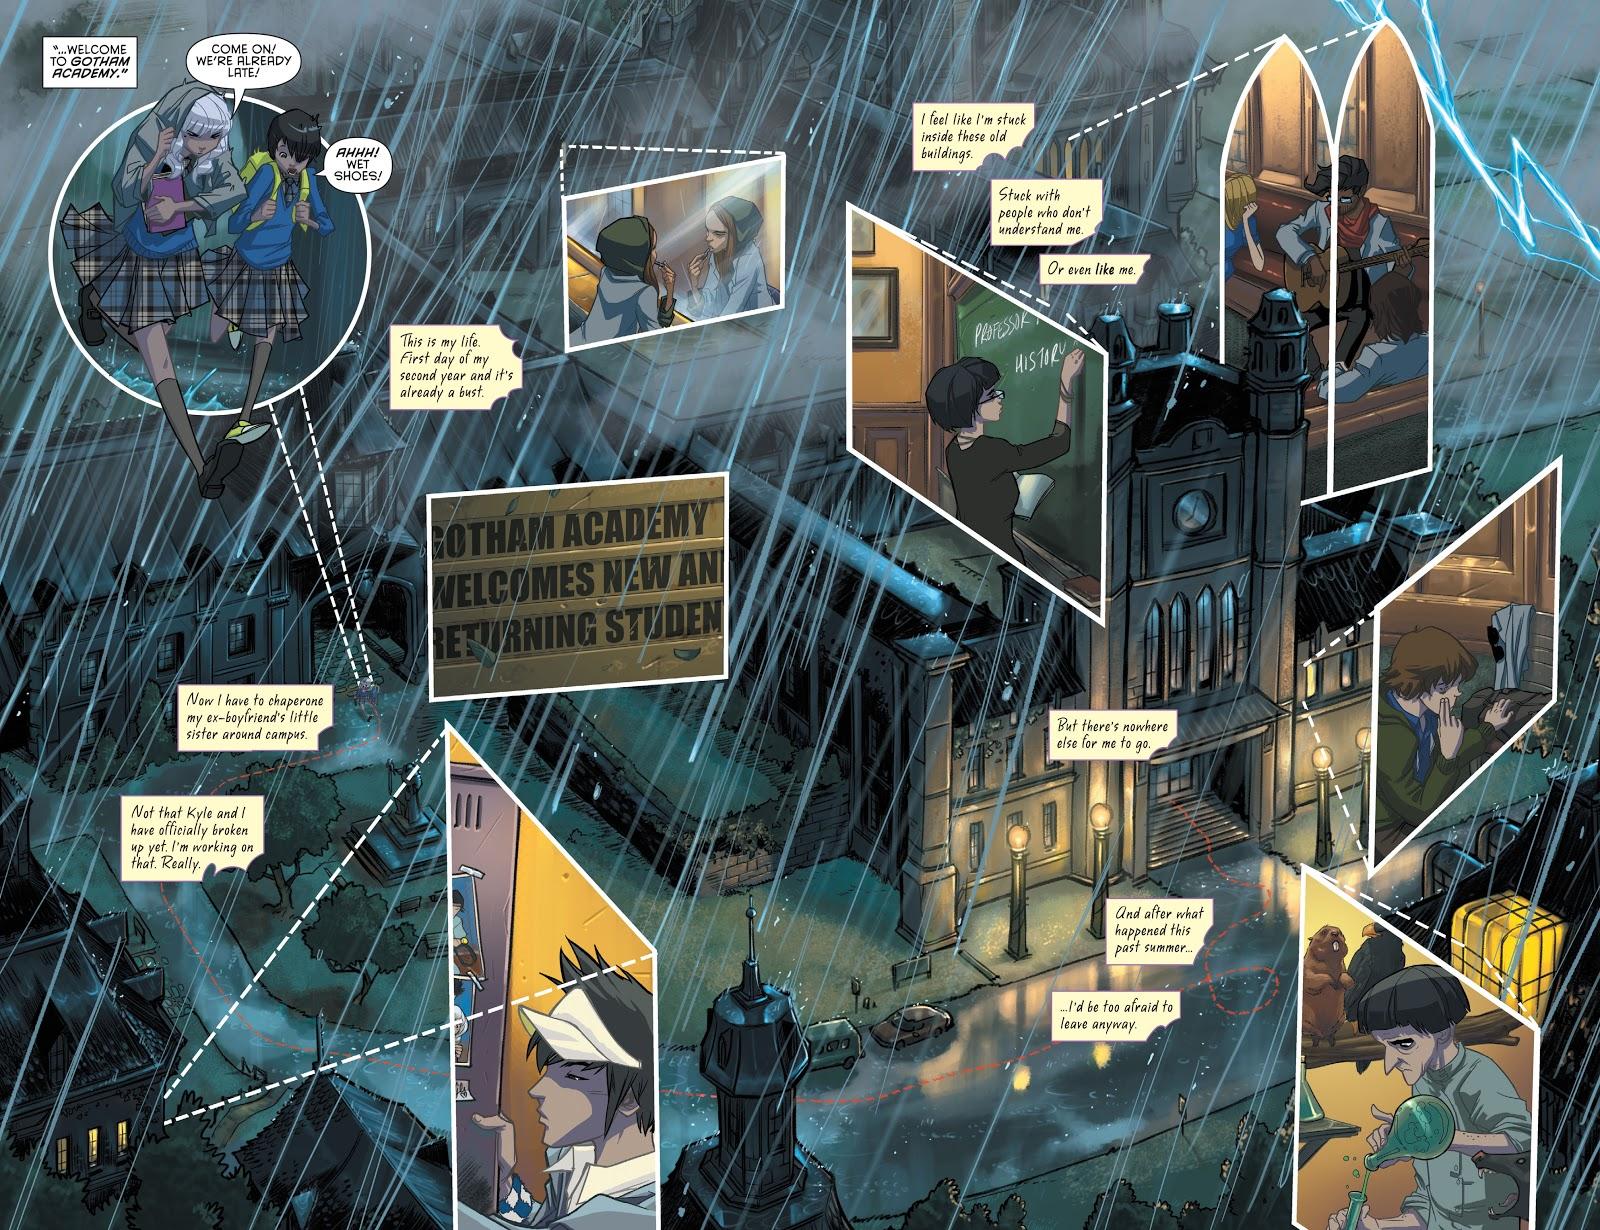 Gotham Academy Welcome to Gotham Academy review